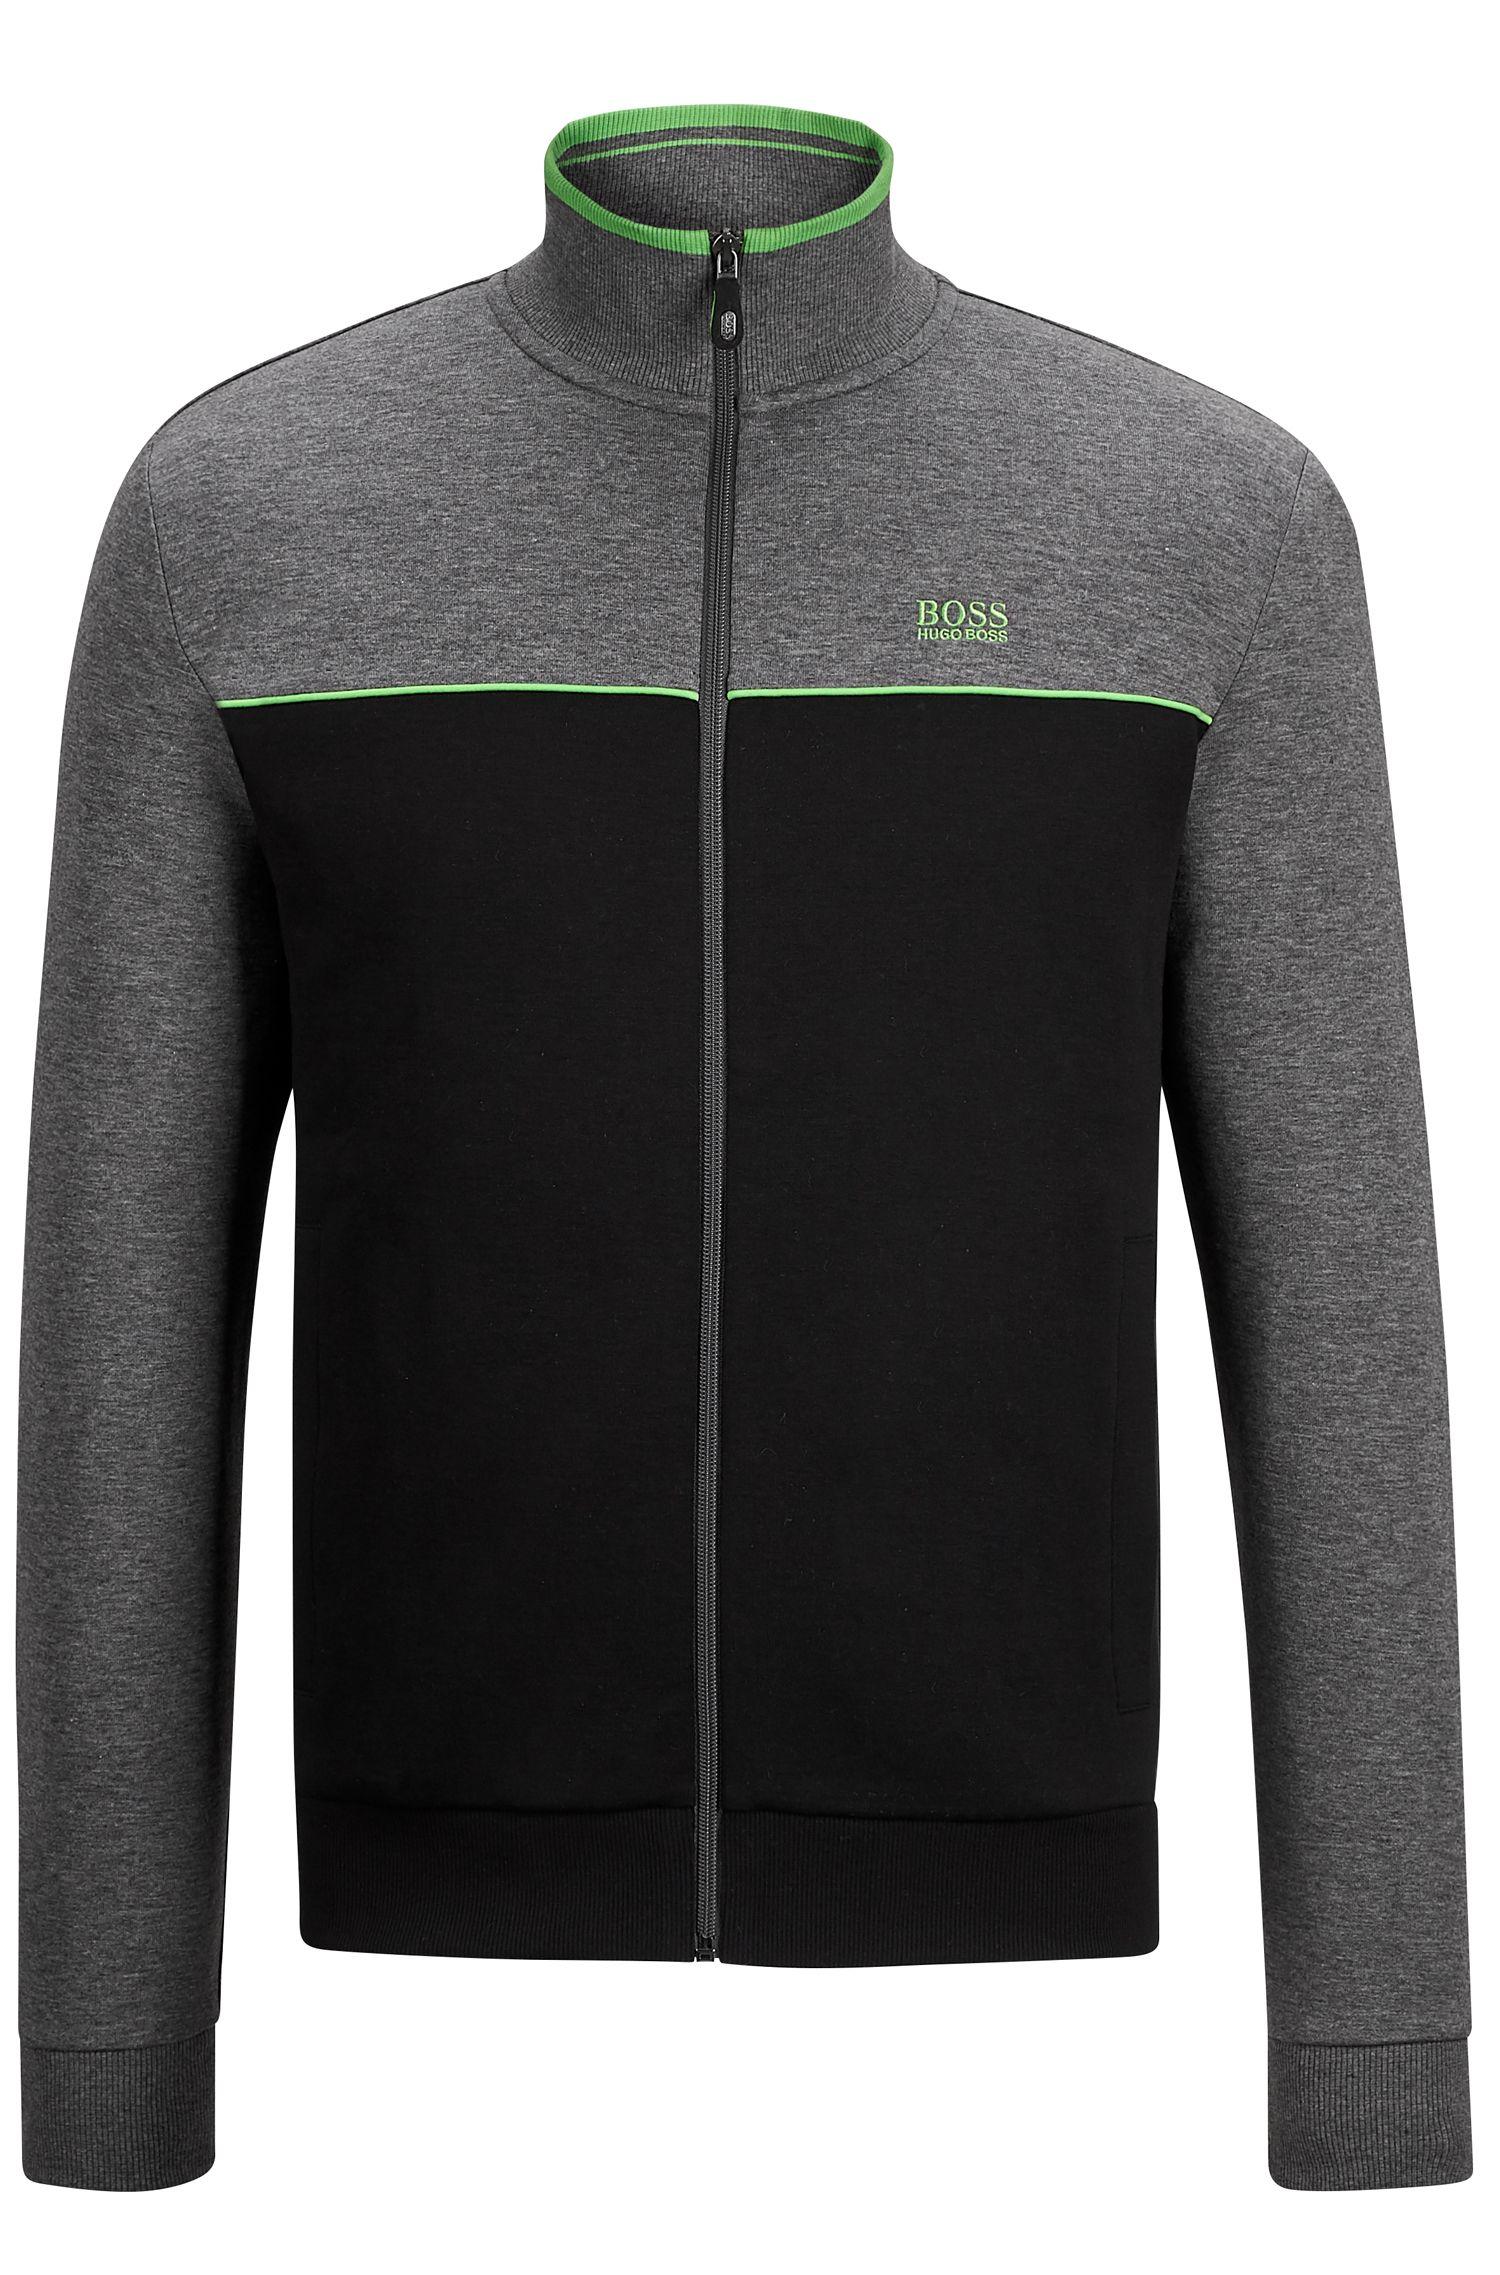 Stretch Cotton Track Jacket | Skaz US, Black